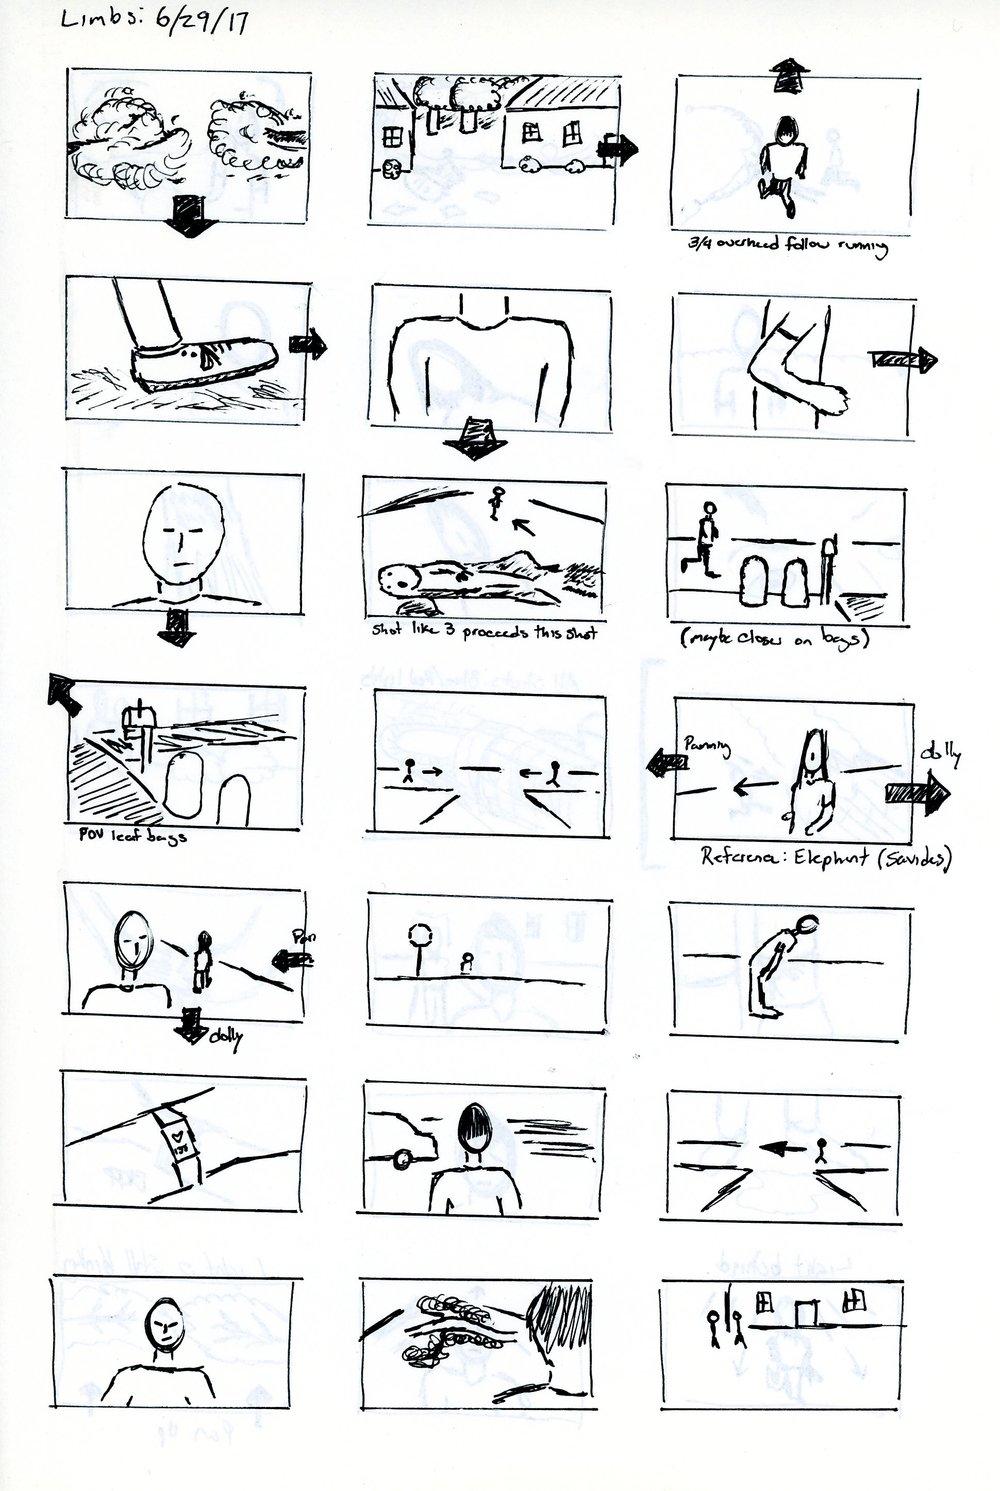 Limbs-Storyboard-A.jpg